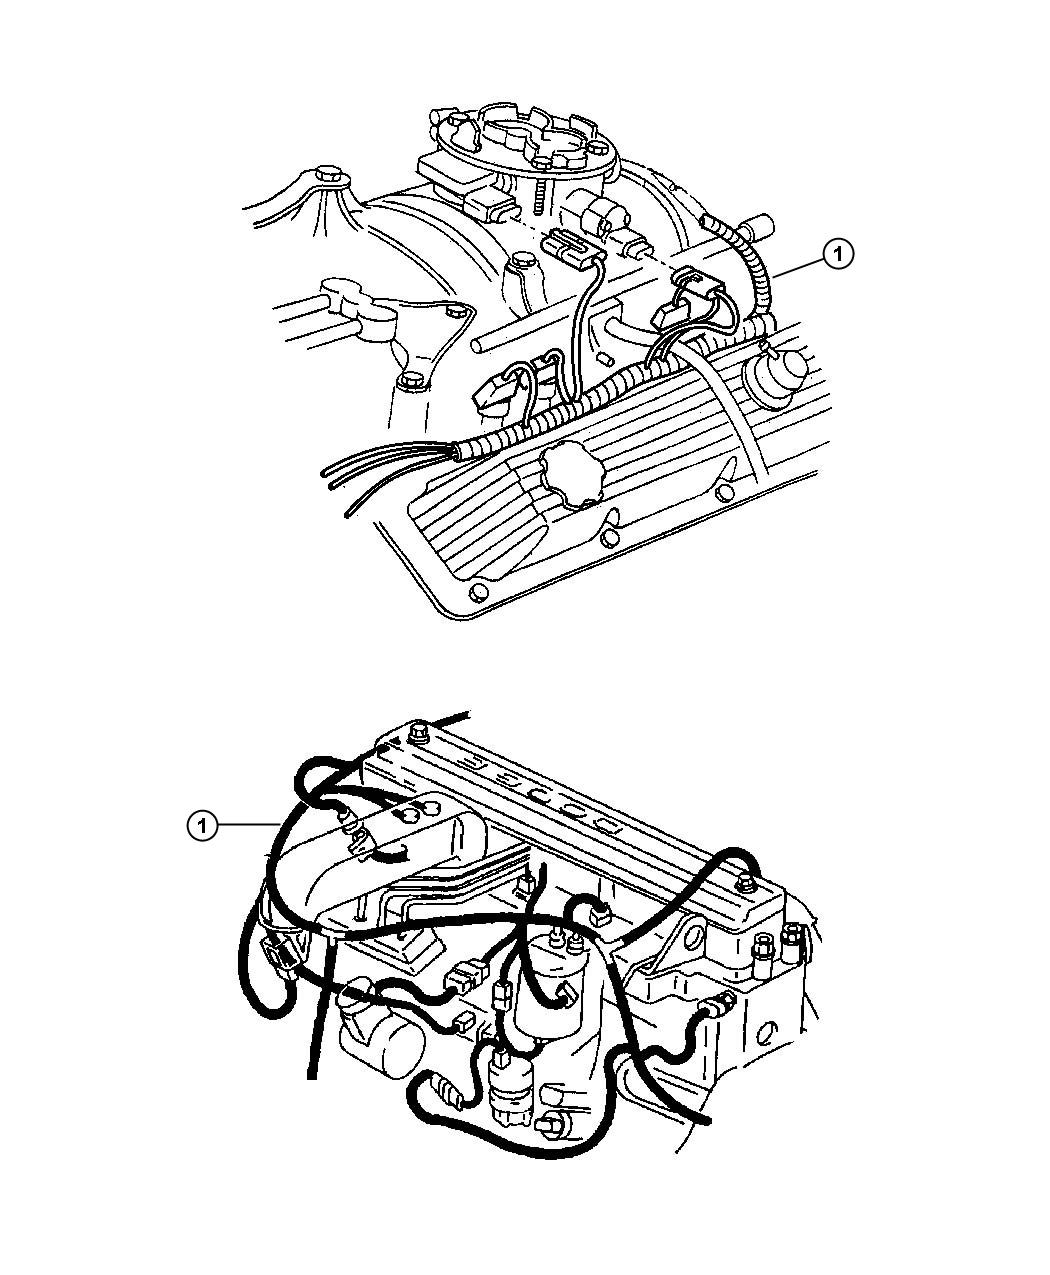 Dodge Ram 2500 Wiring. Engine. (06/26/00 & after), 06/26